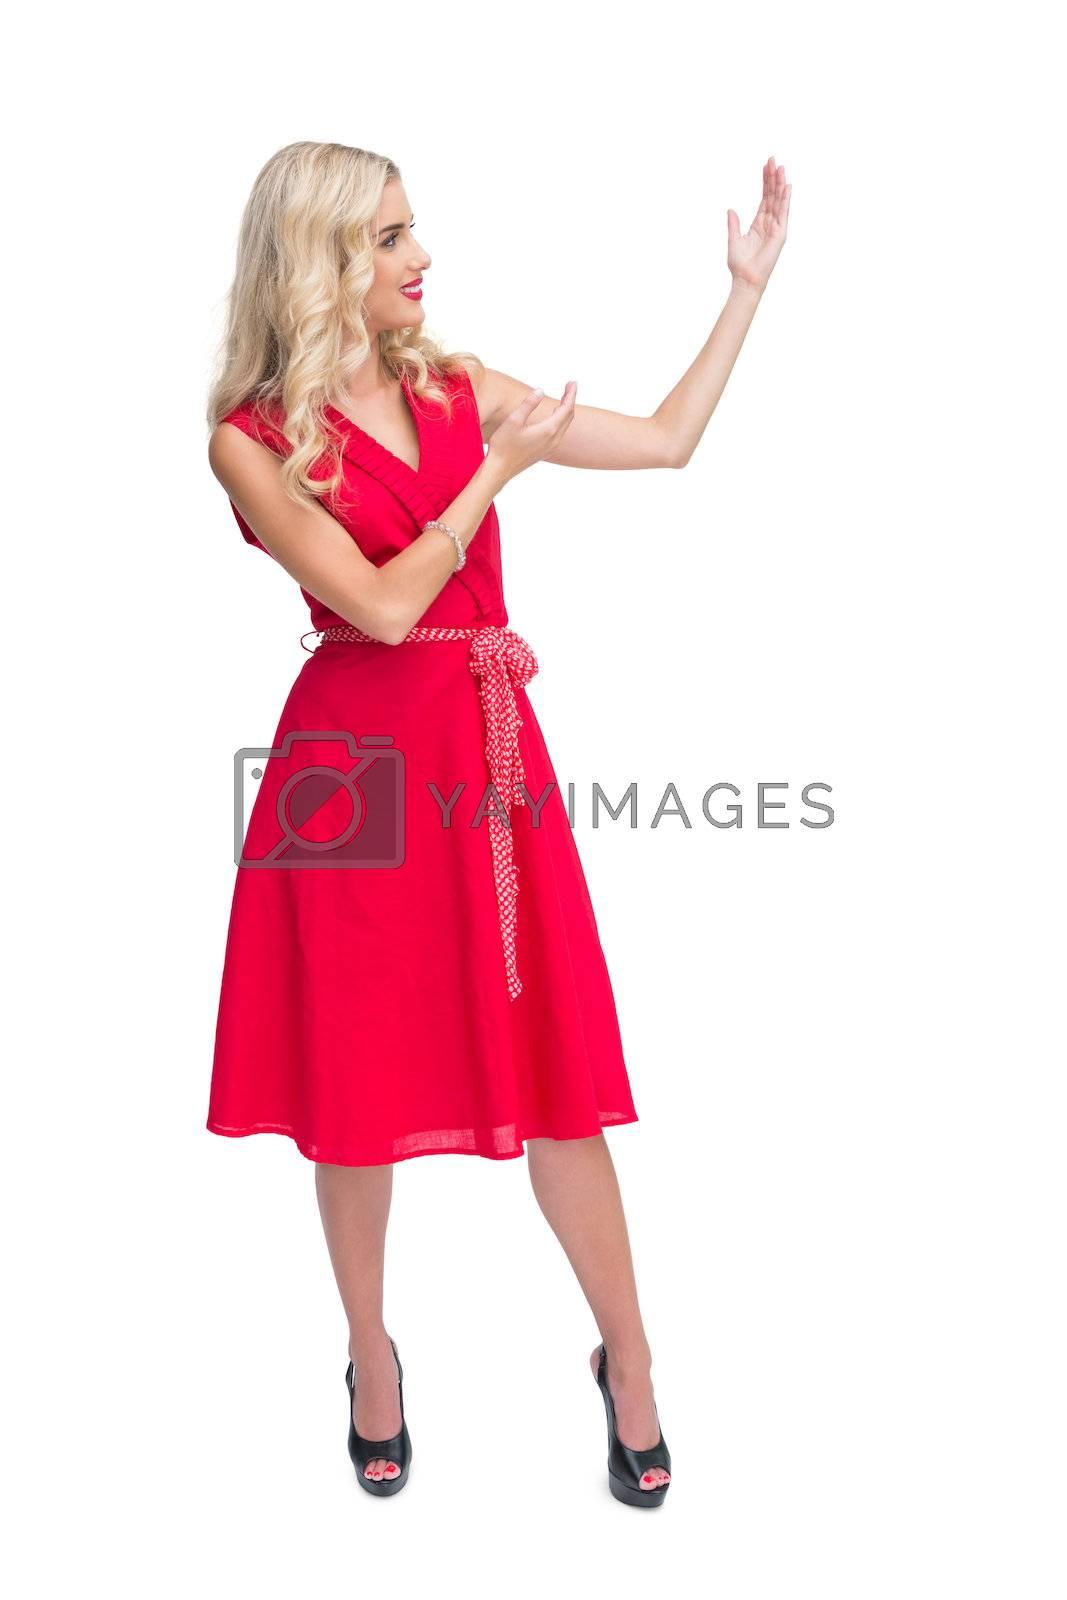 Glamorous blonde woman presenting something by Wavebreakmedia